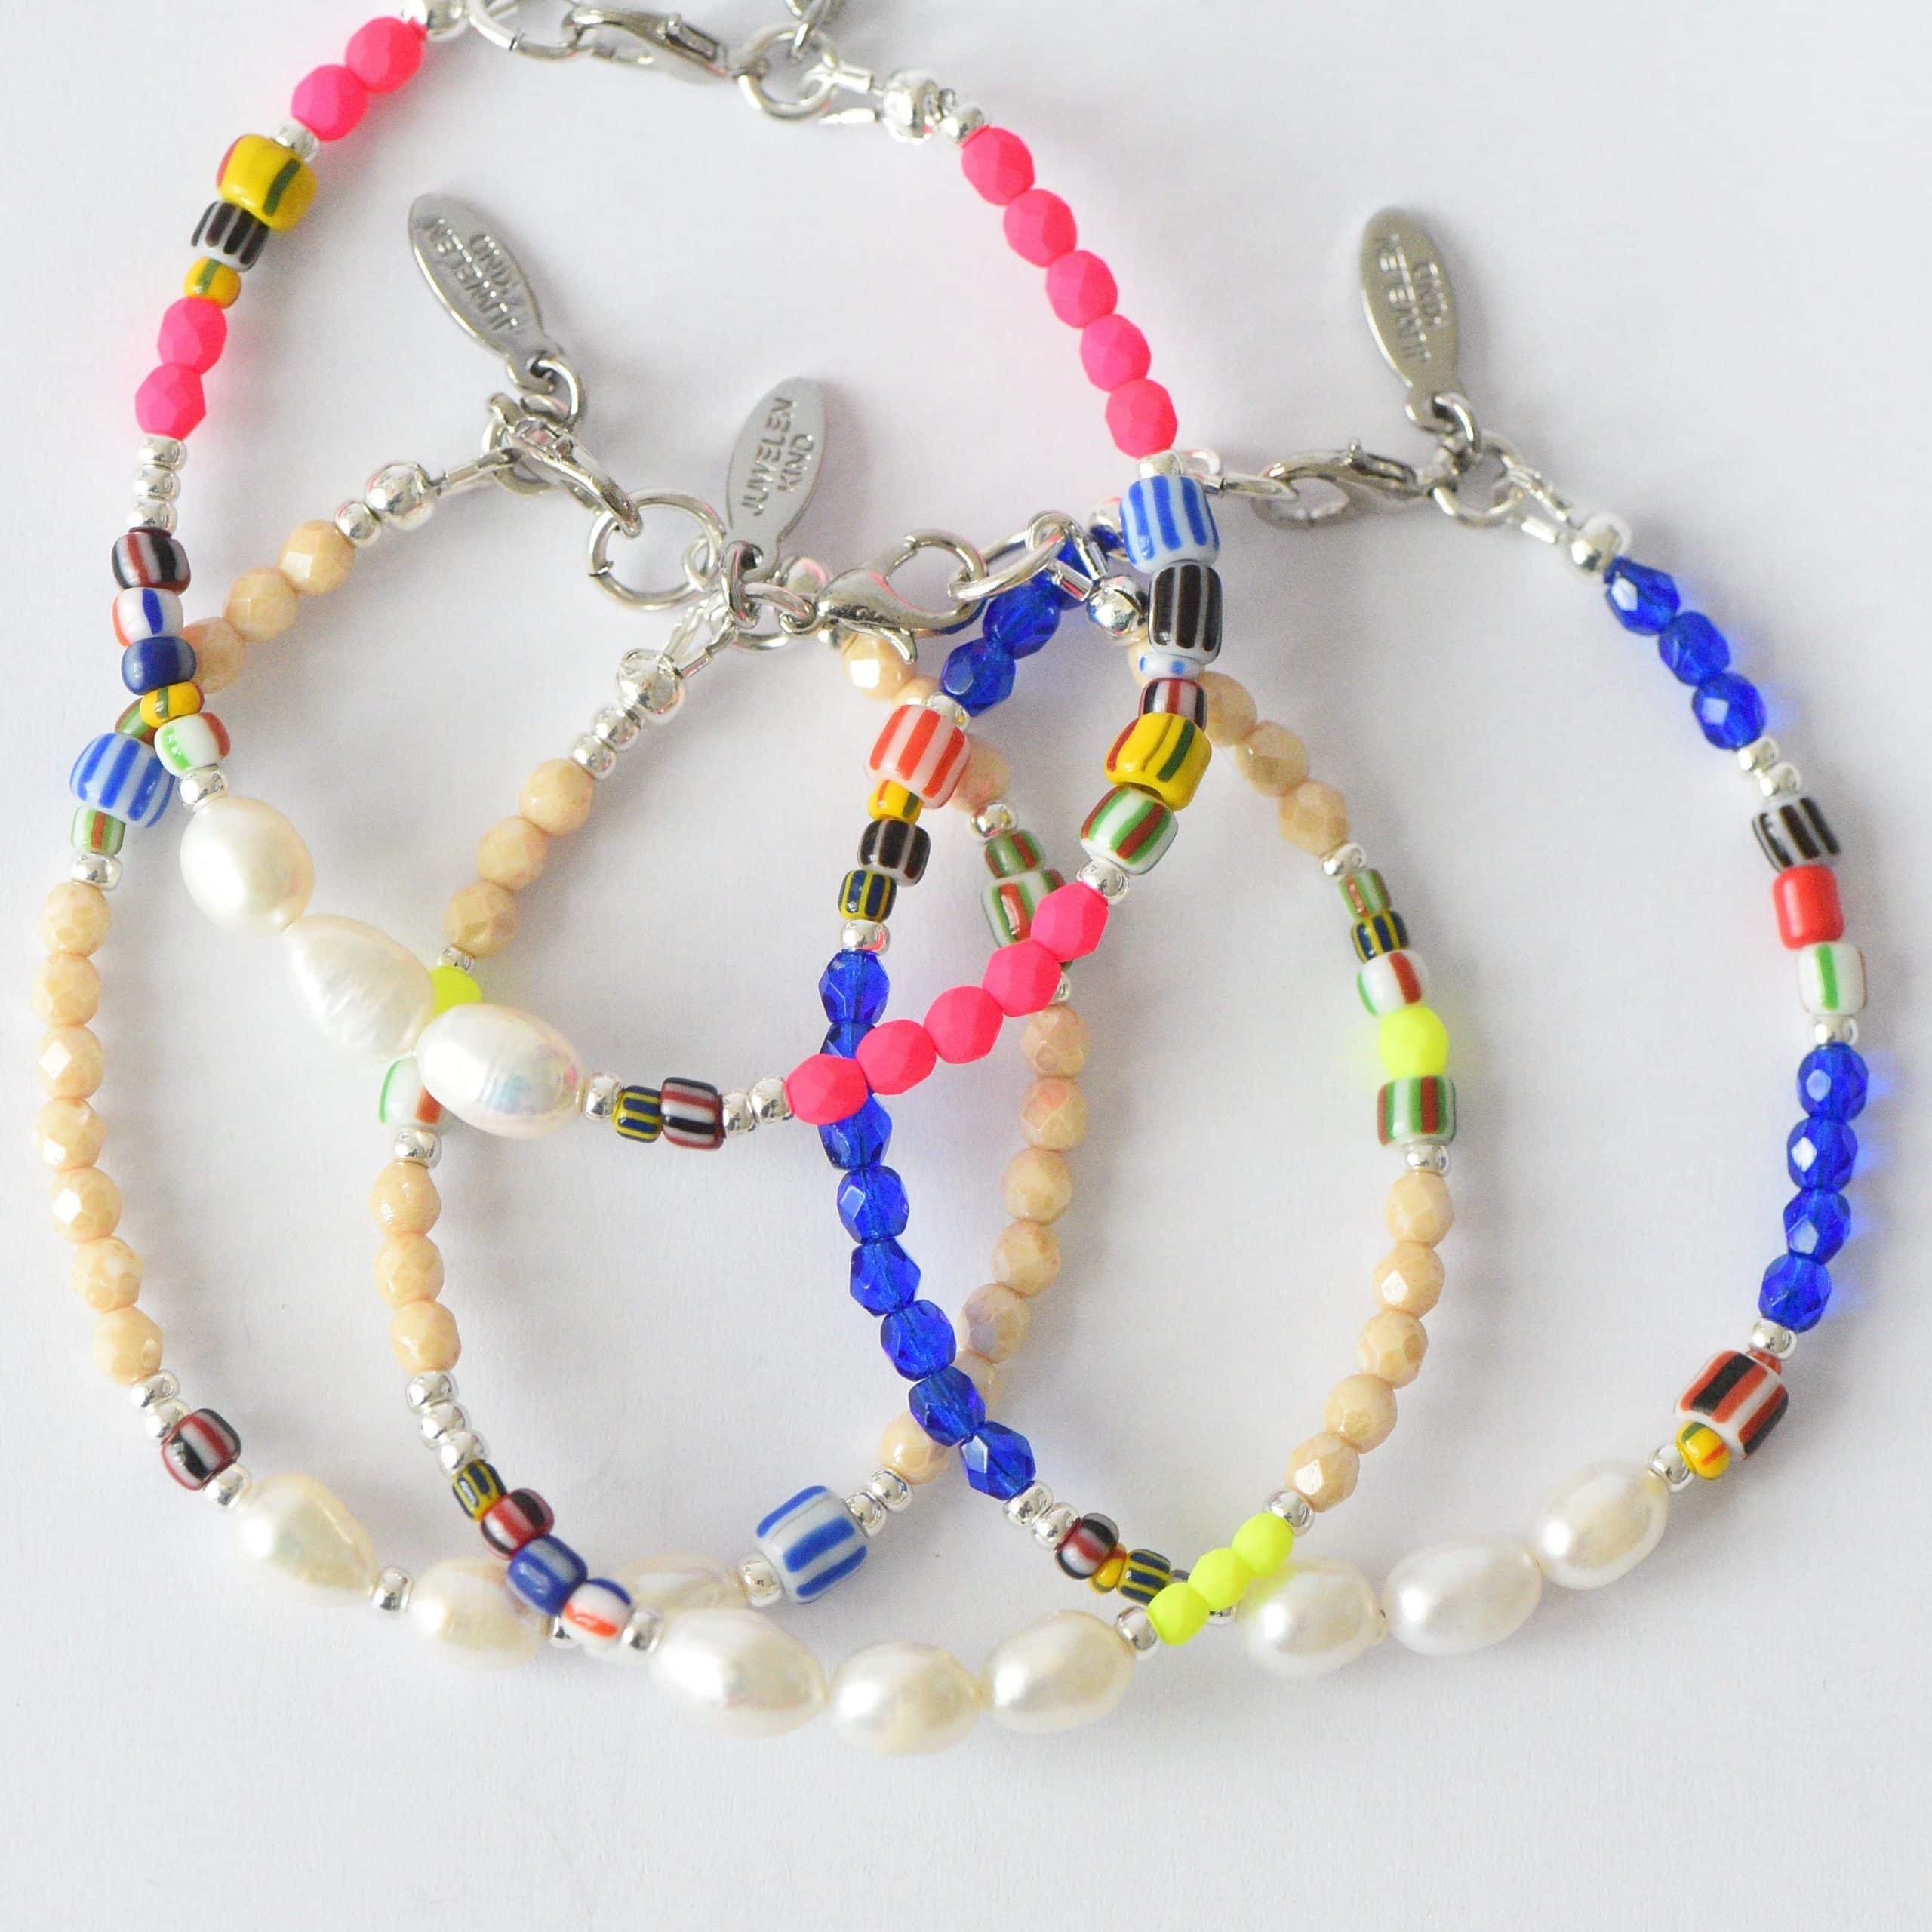 LJSLYJ Bunte Acryl Perlen Armb/änder f/ür Frauen lila Kristall Yoga Armband Lotus Schmuck